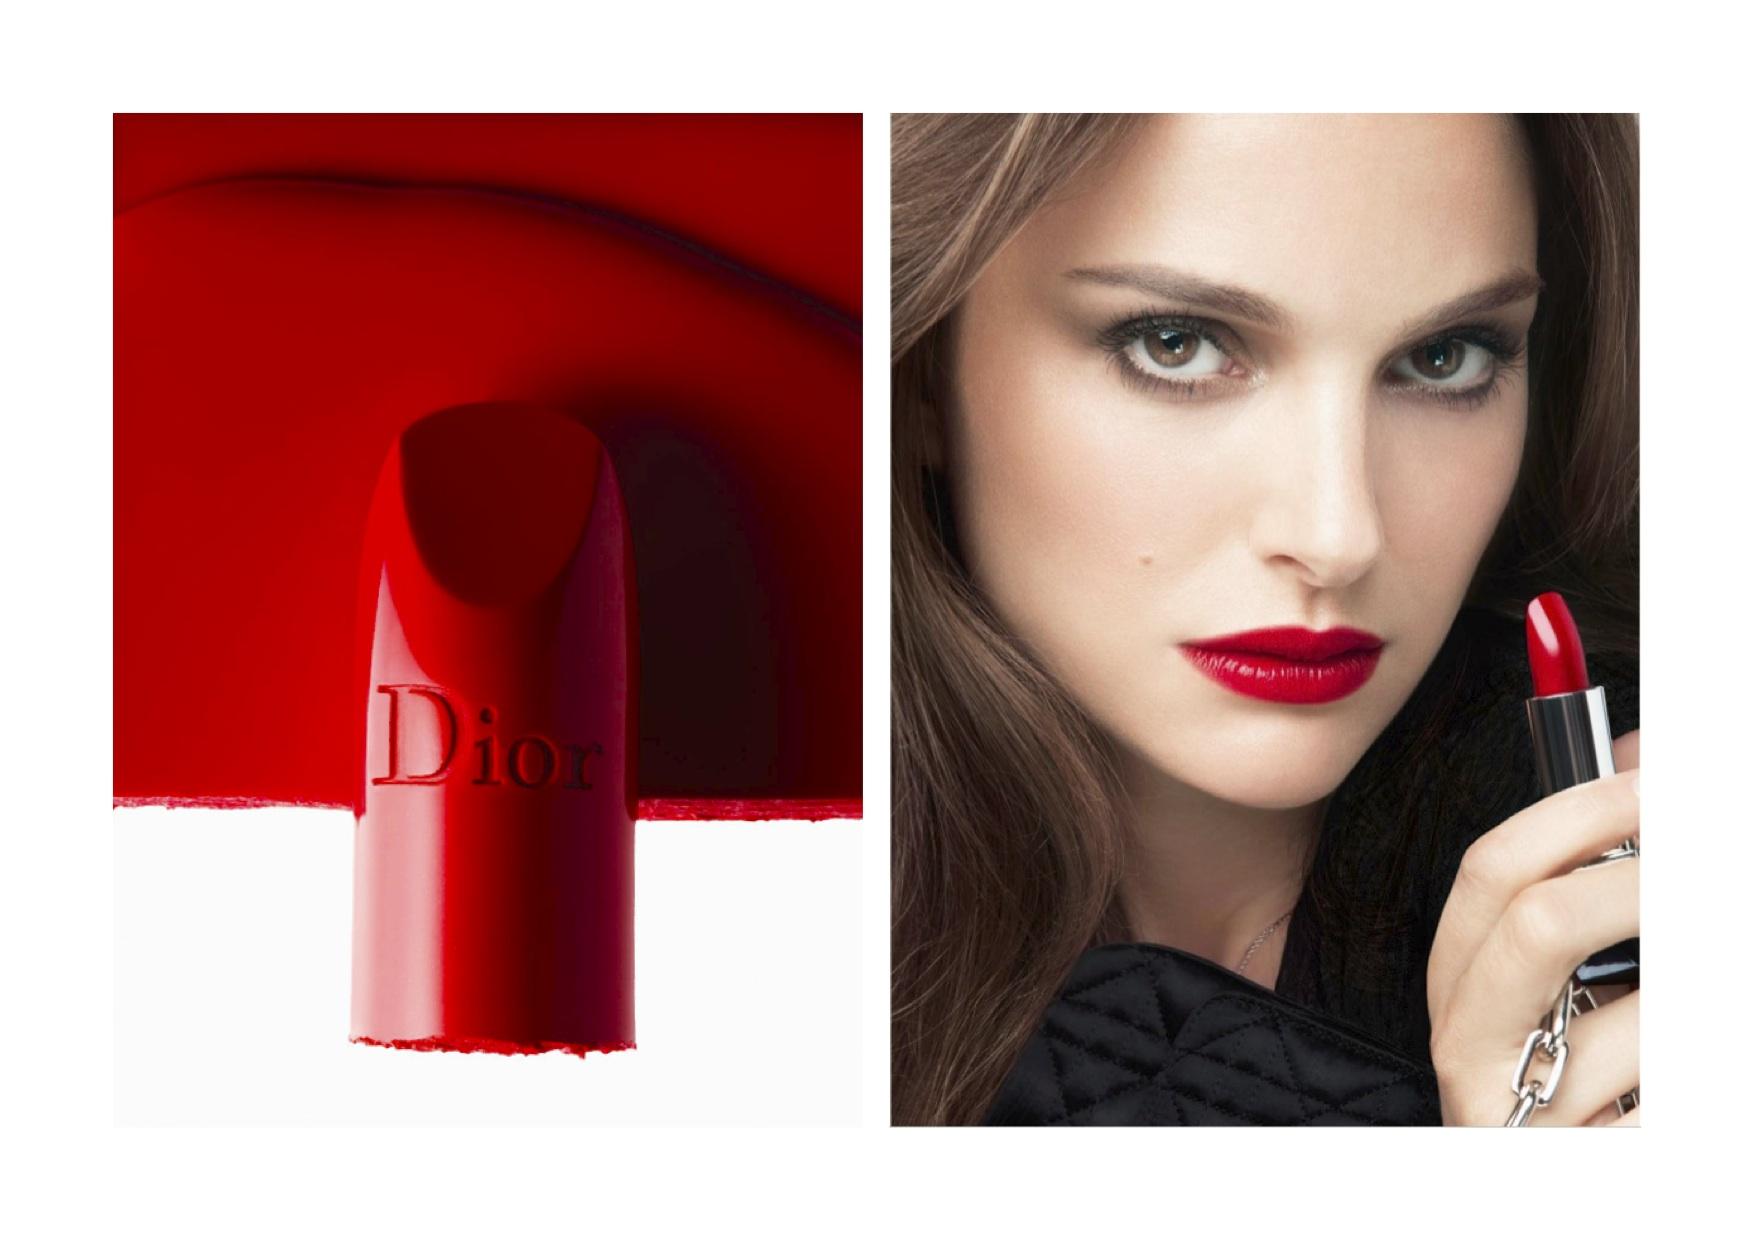 Rouge-Dior-Photoshoot-2013-natalie-portman-34803534-1753-1240